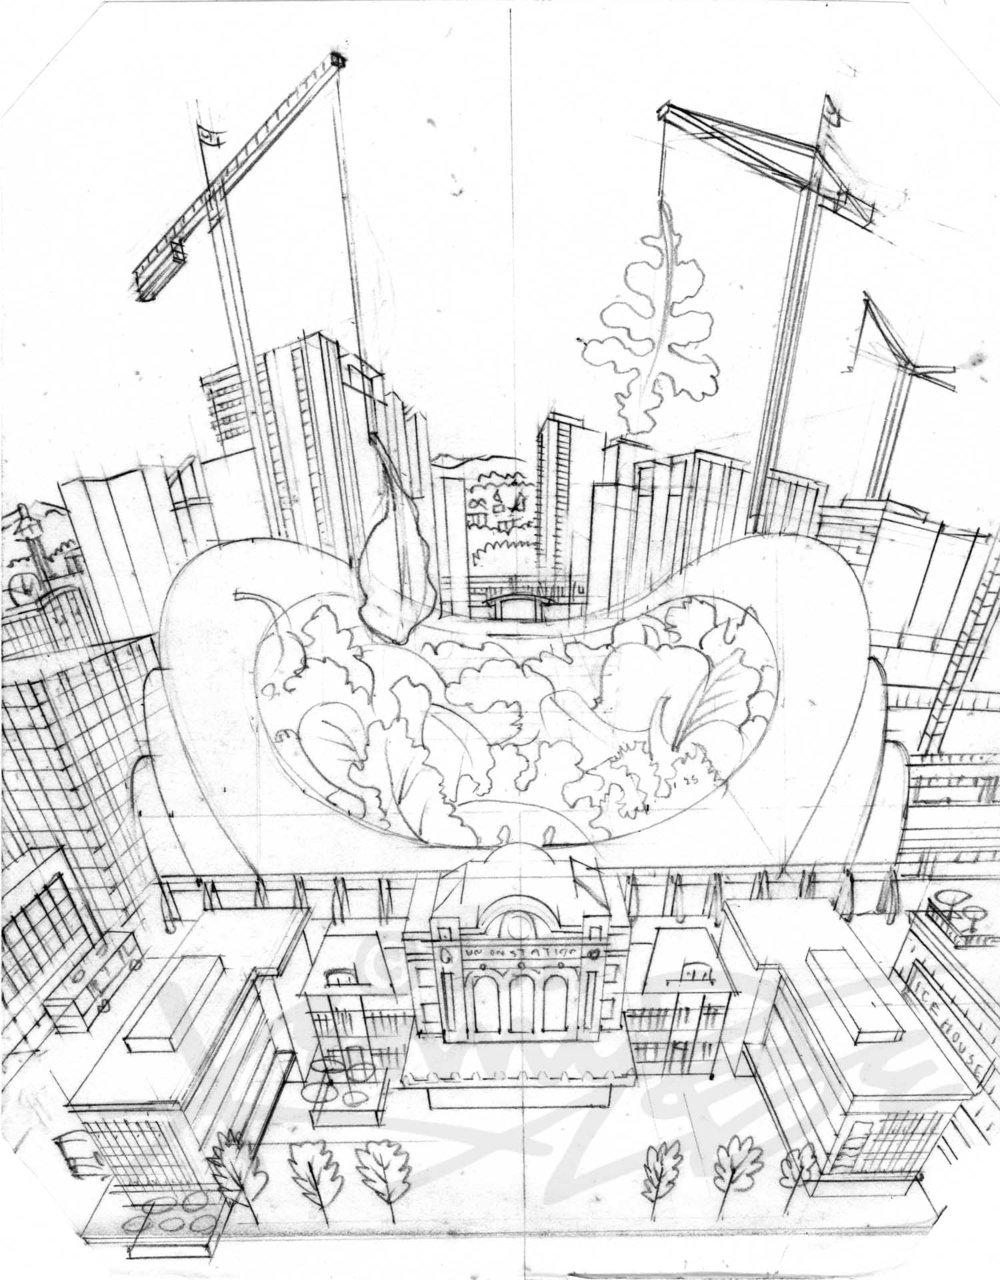 2. Union Station Mesclun Denver Neighborhood Seed Company Kenny Be Art & Design kennybe.com Original Pencil.jpg